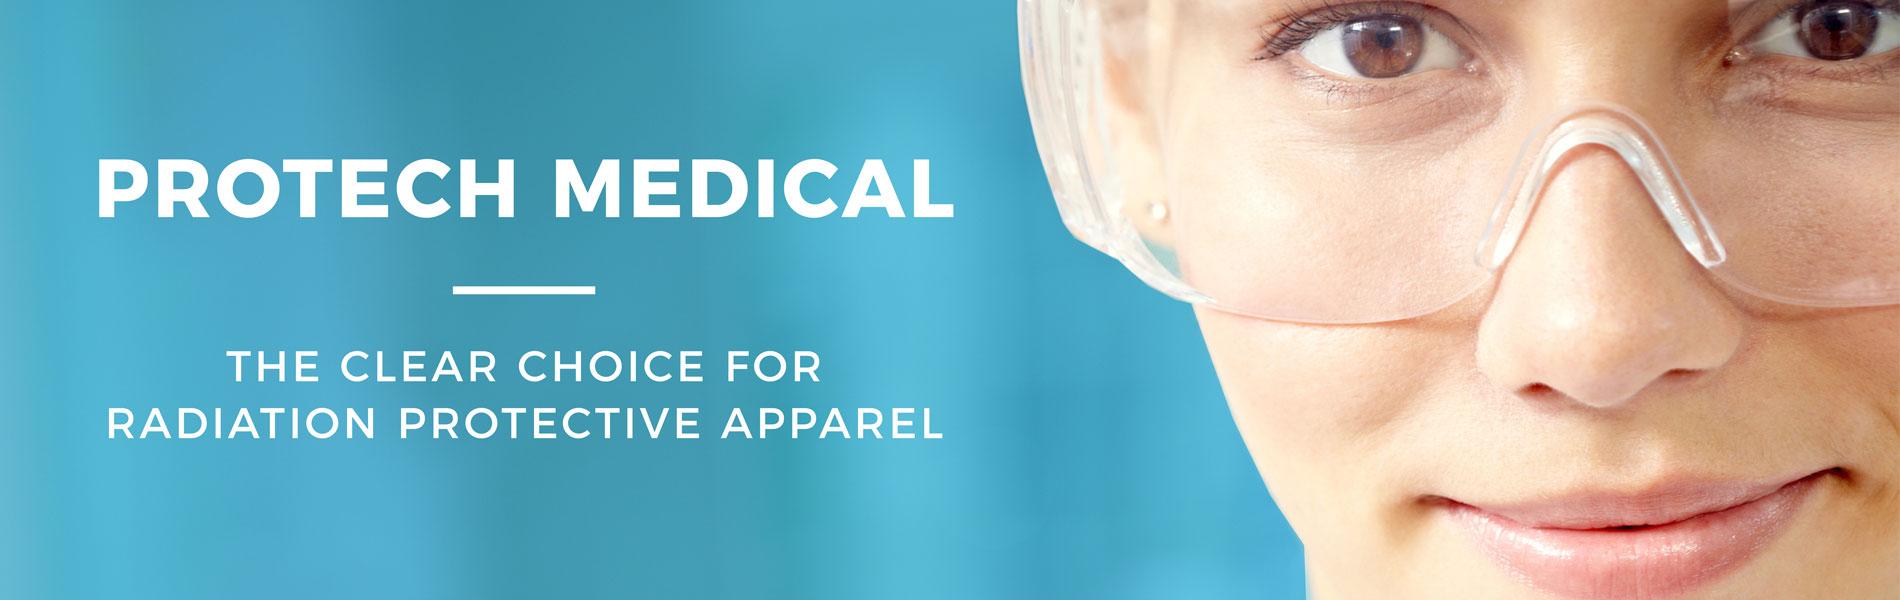 Home_Protech-Leaded-Eyewear2-ed-1900x600.jpg